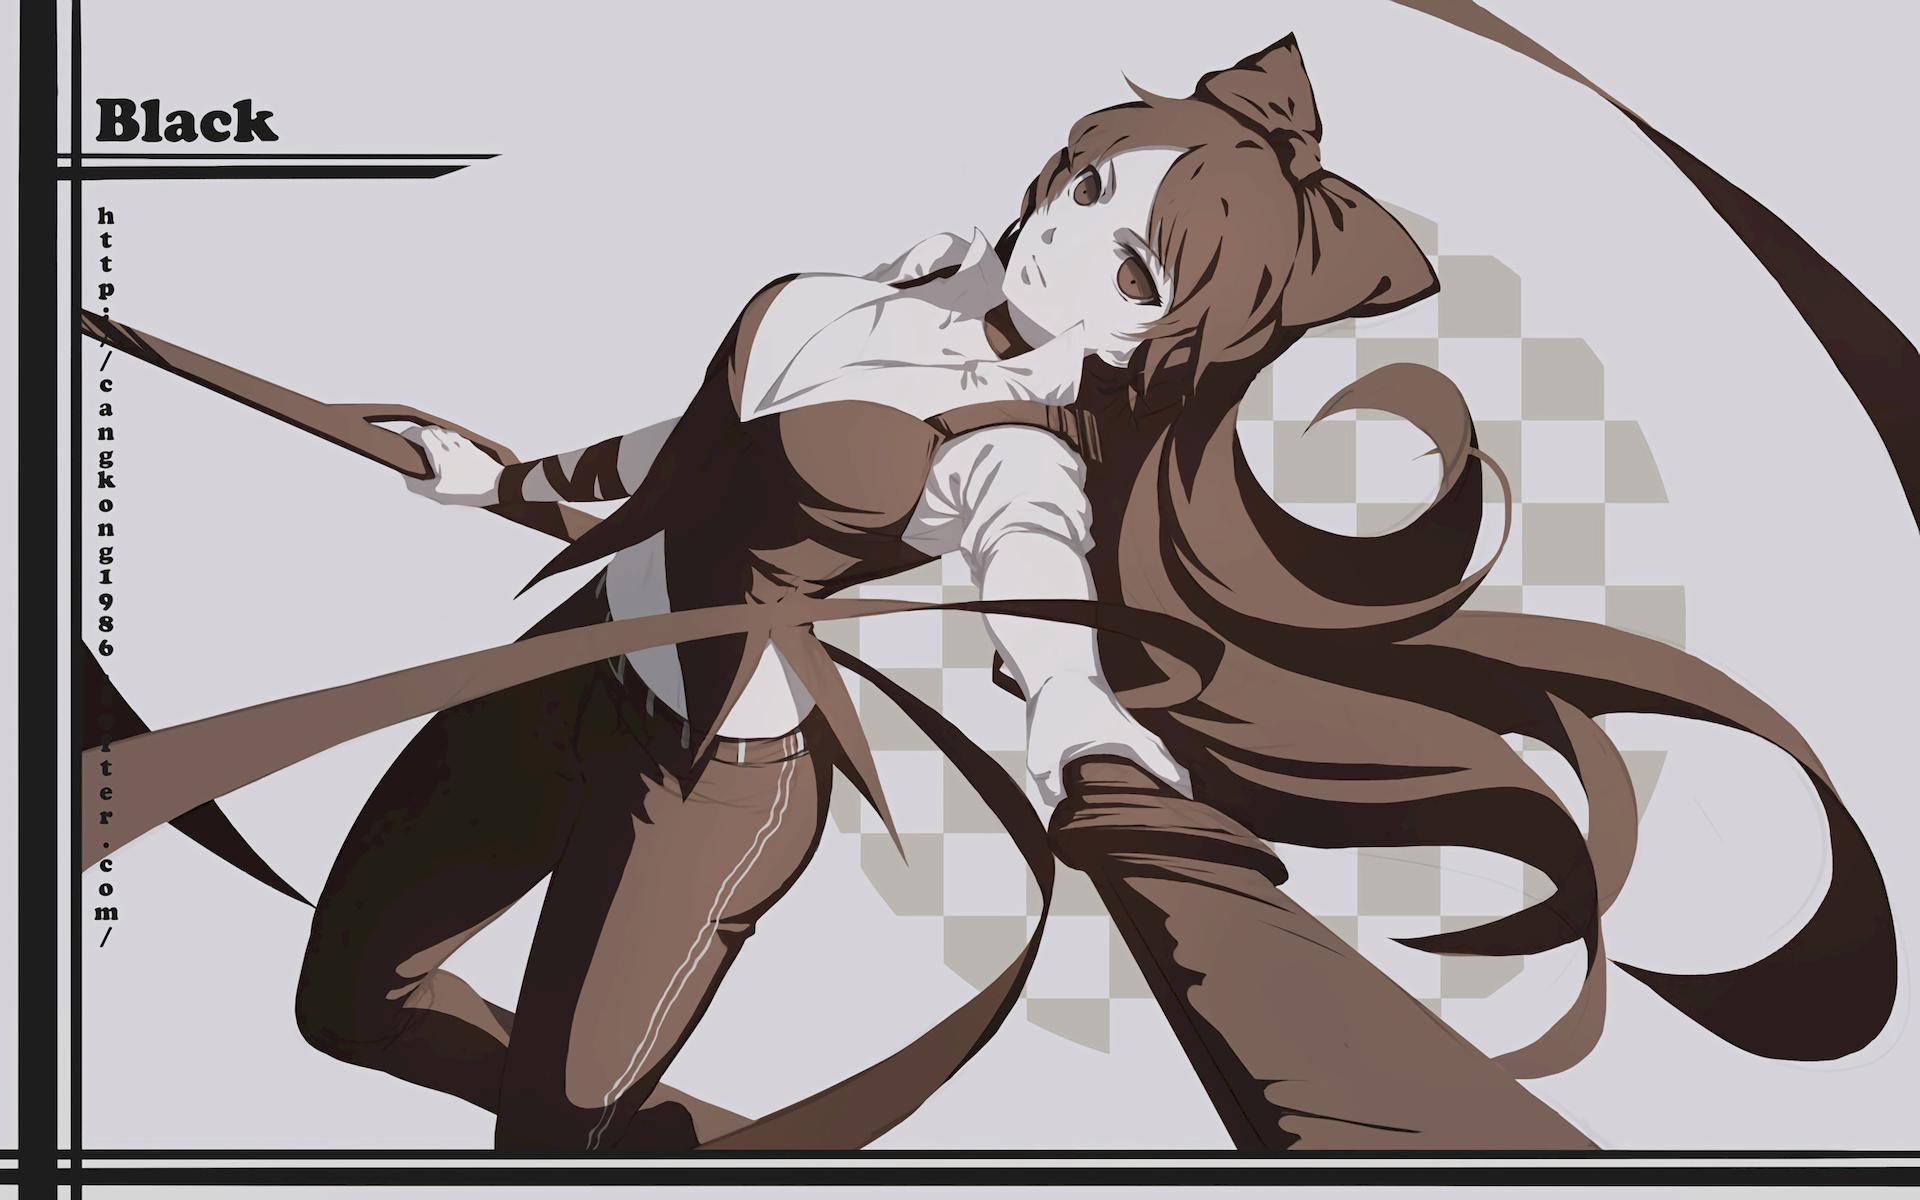 Rwby Computer Wallpapers Desktop Backgrounds 1920x1200 Id 578840 Rwby Wallpaper Rwby Blake Anime